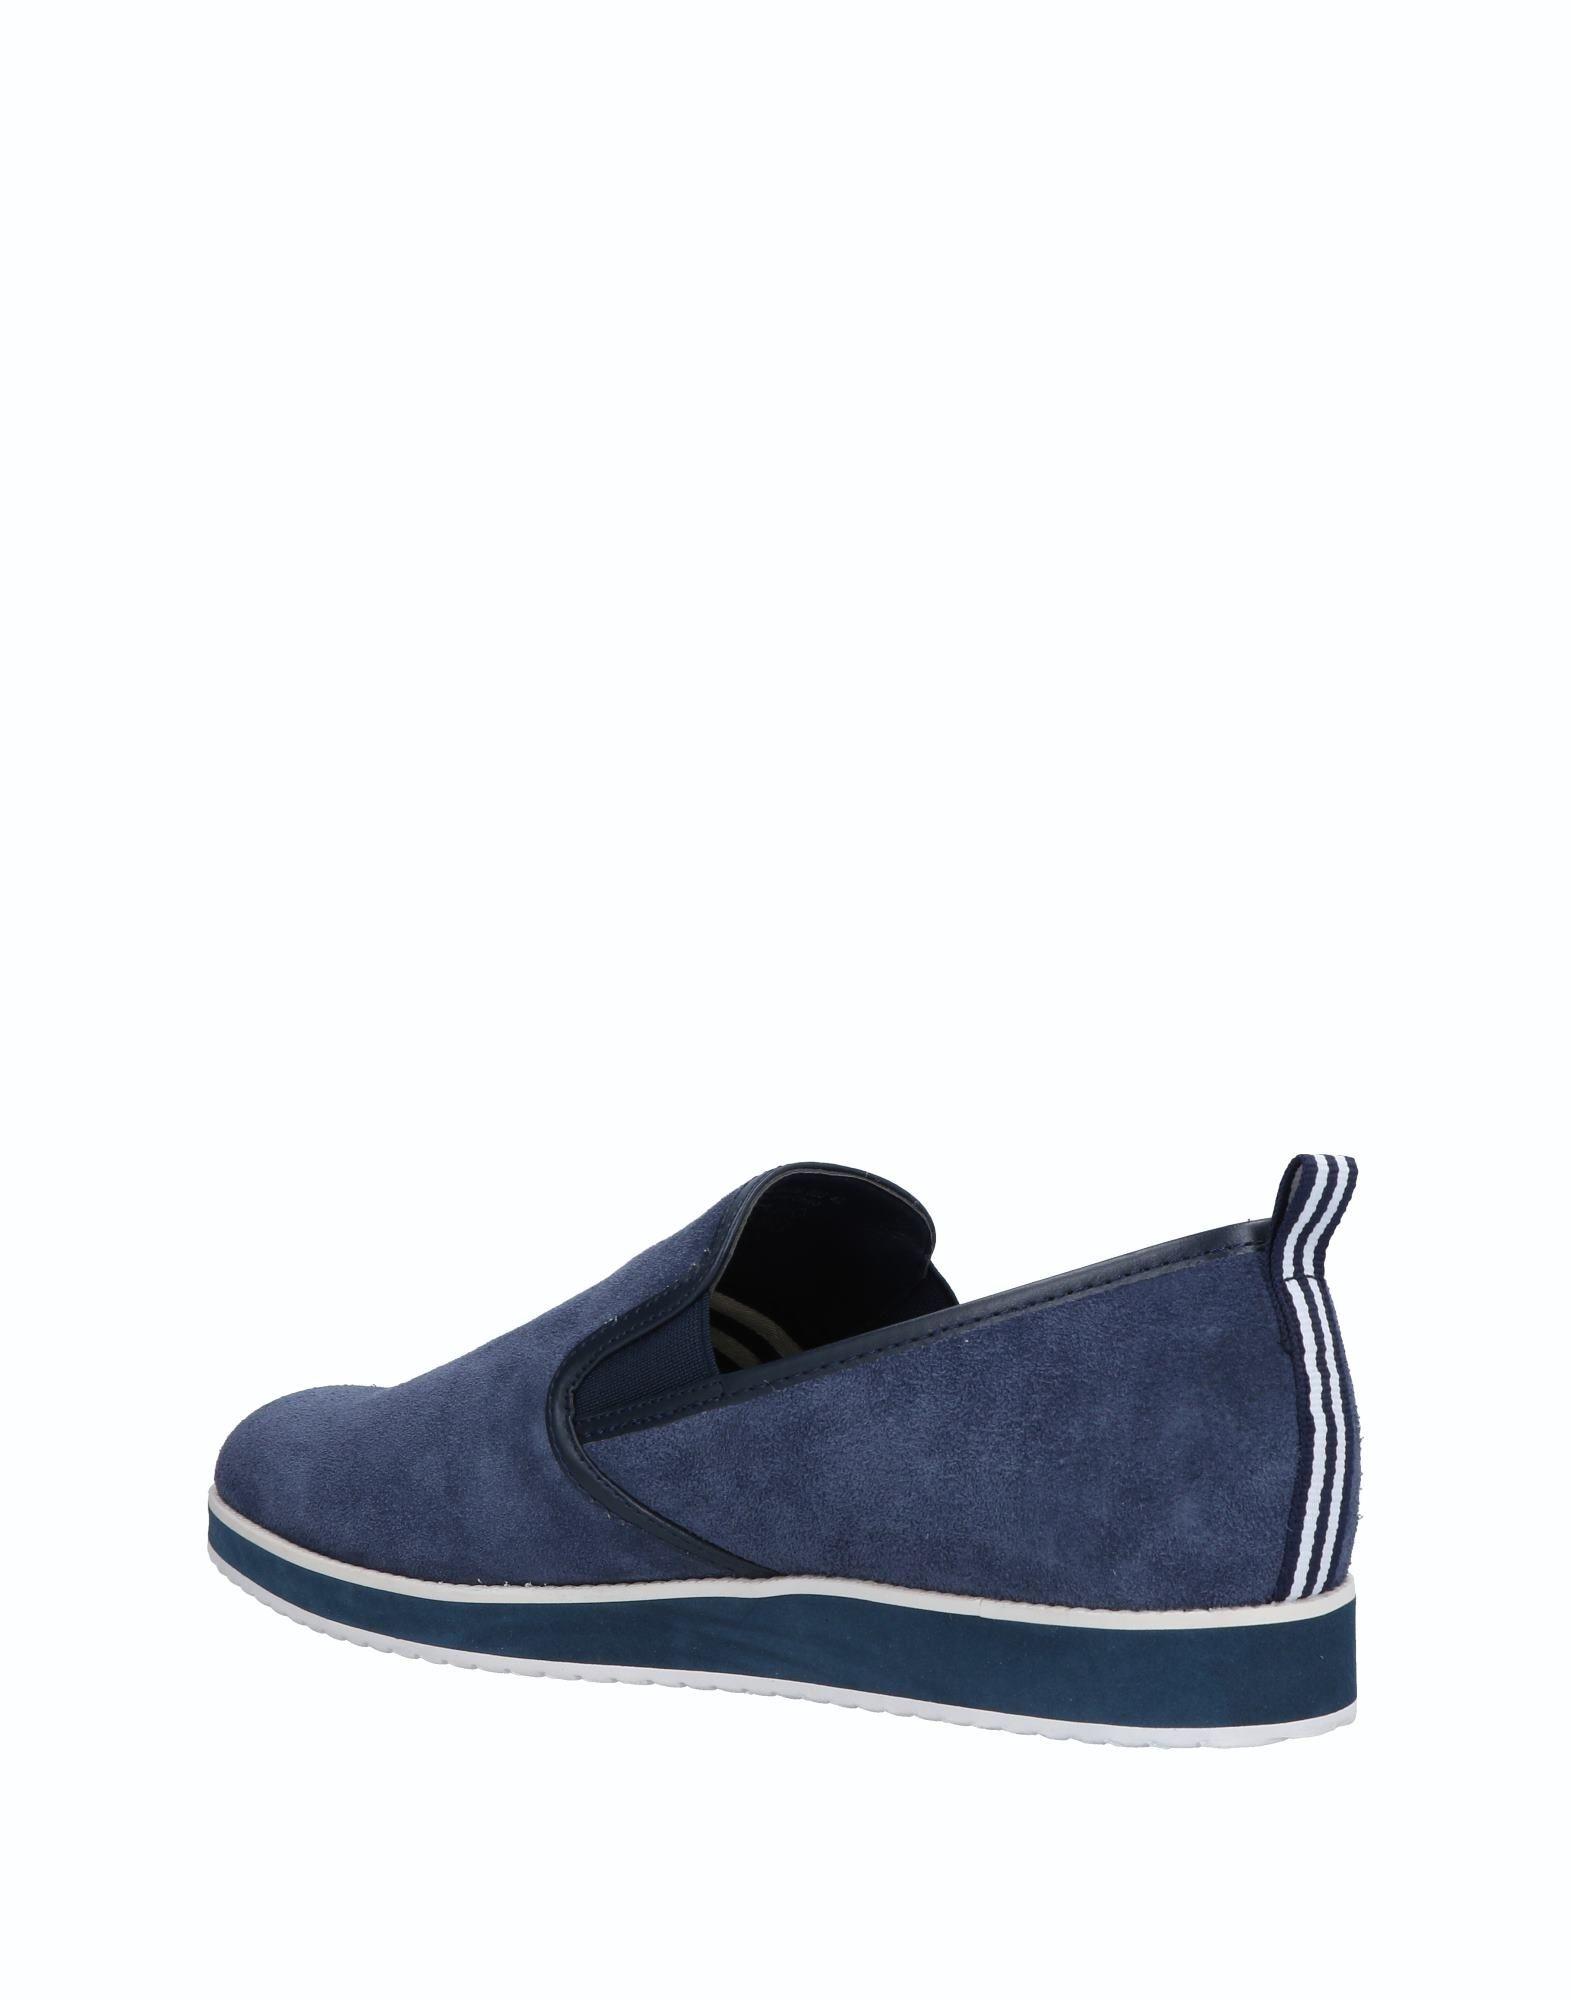 Marina Yachting Sneakers - - - Men Marina Yachting Sneakers online on  United Kingdom - 11503393EN 8985a5